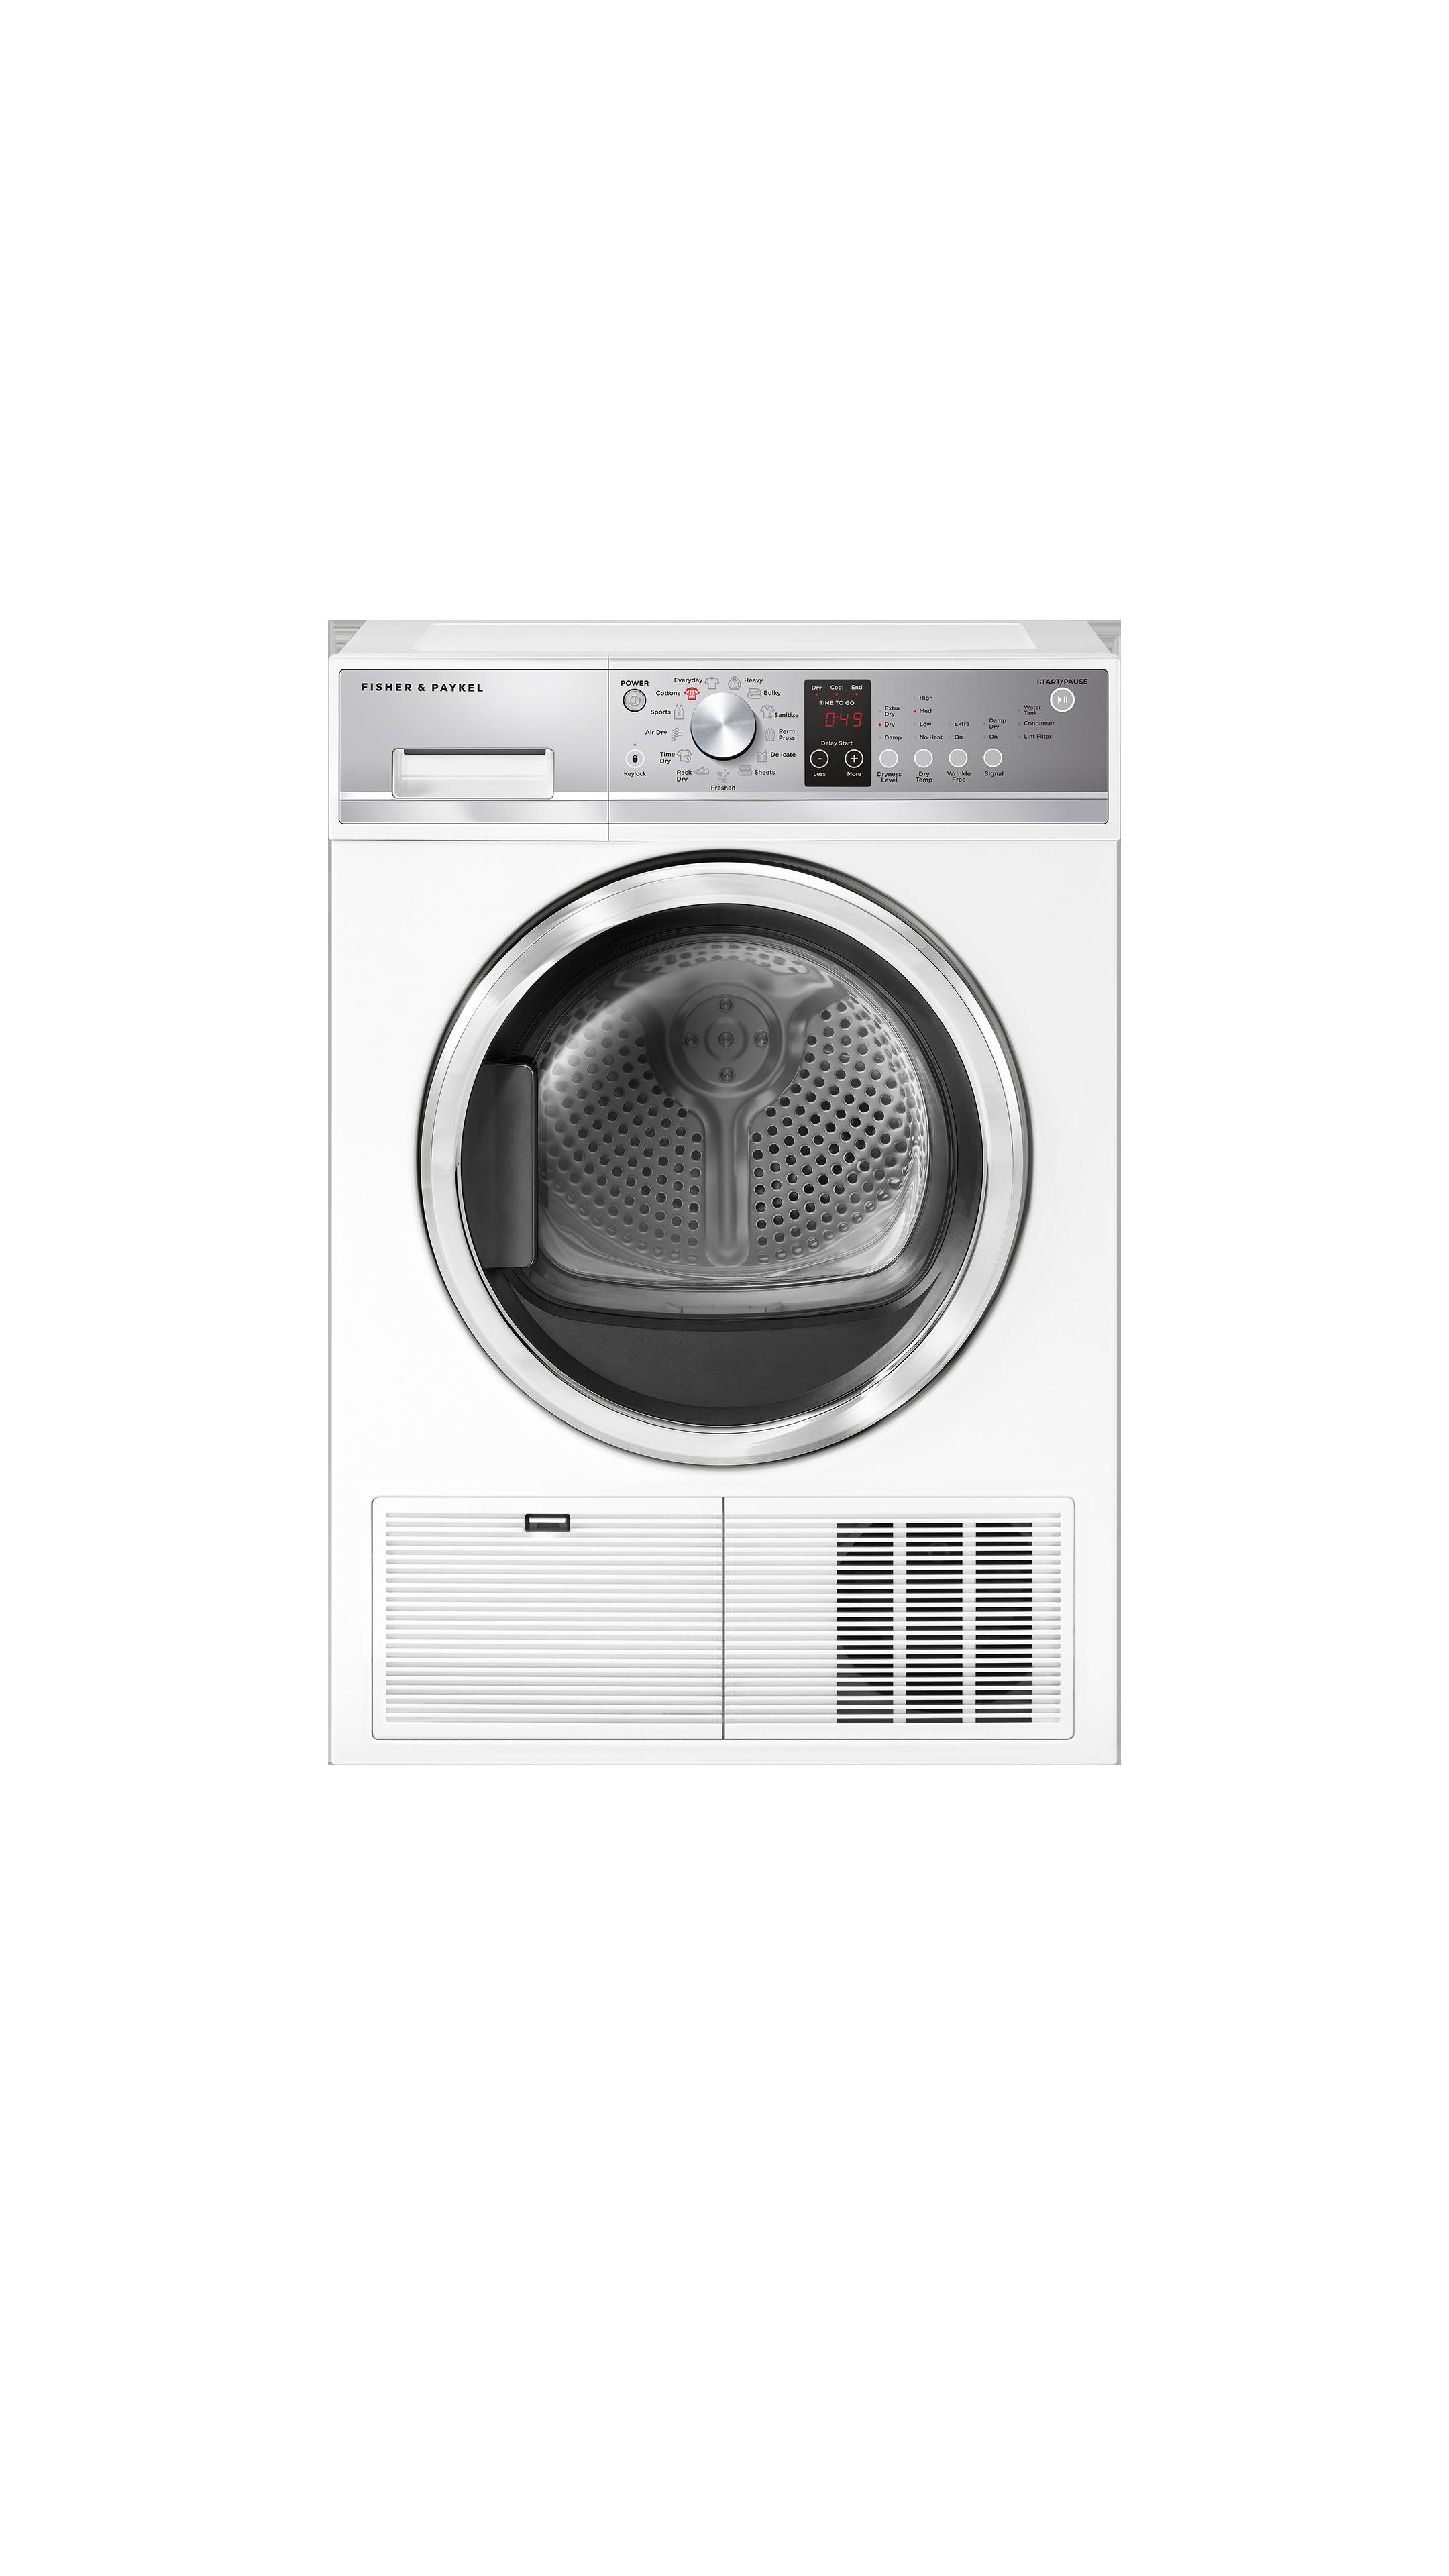 Model: DE4024P1 | Fisher and Paykel Condensing Dryer, 4.0 cu ft